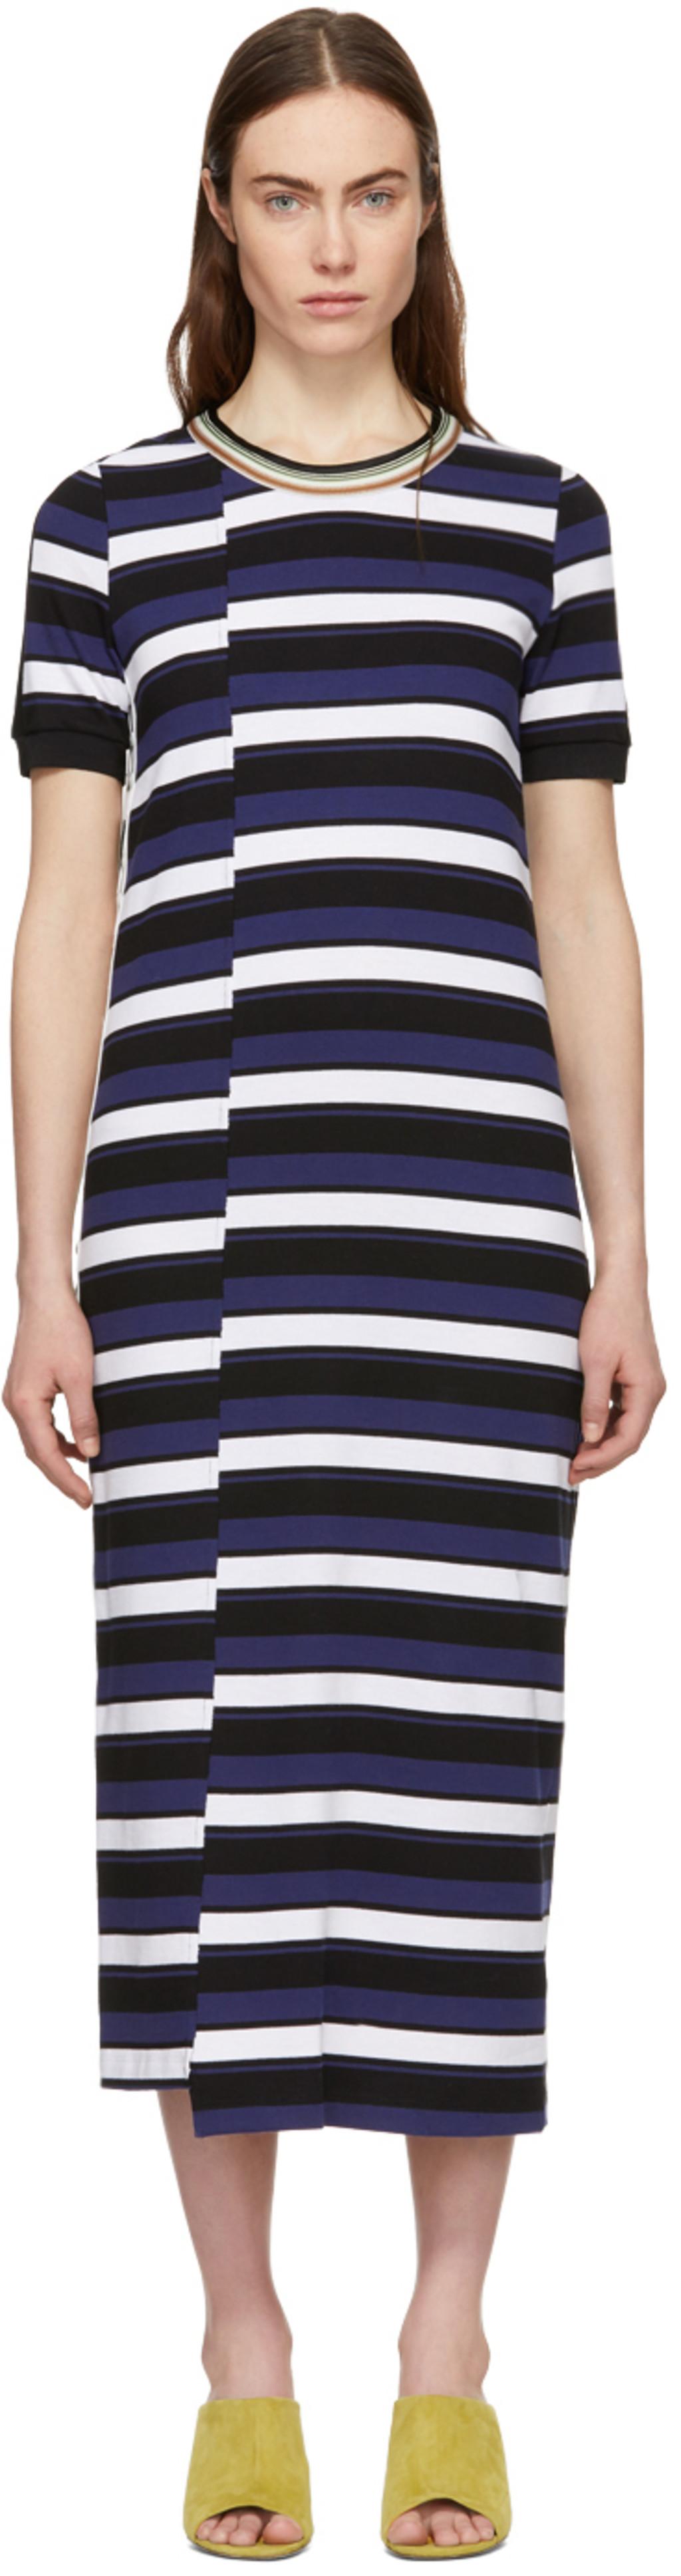 DRESSES - Short dresses 3.1 Phillip Lim 02PVQmwmN